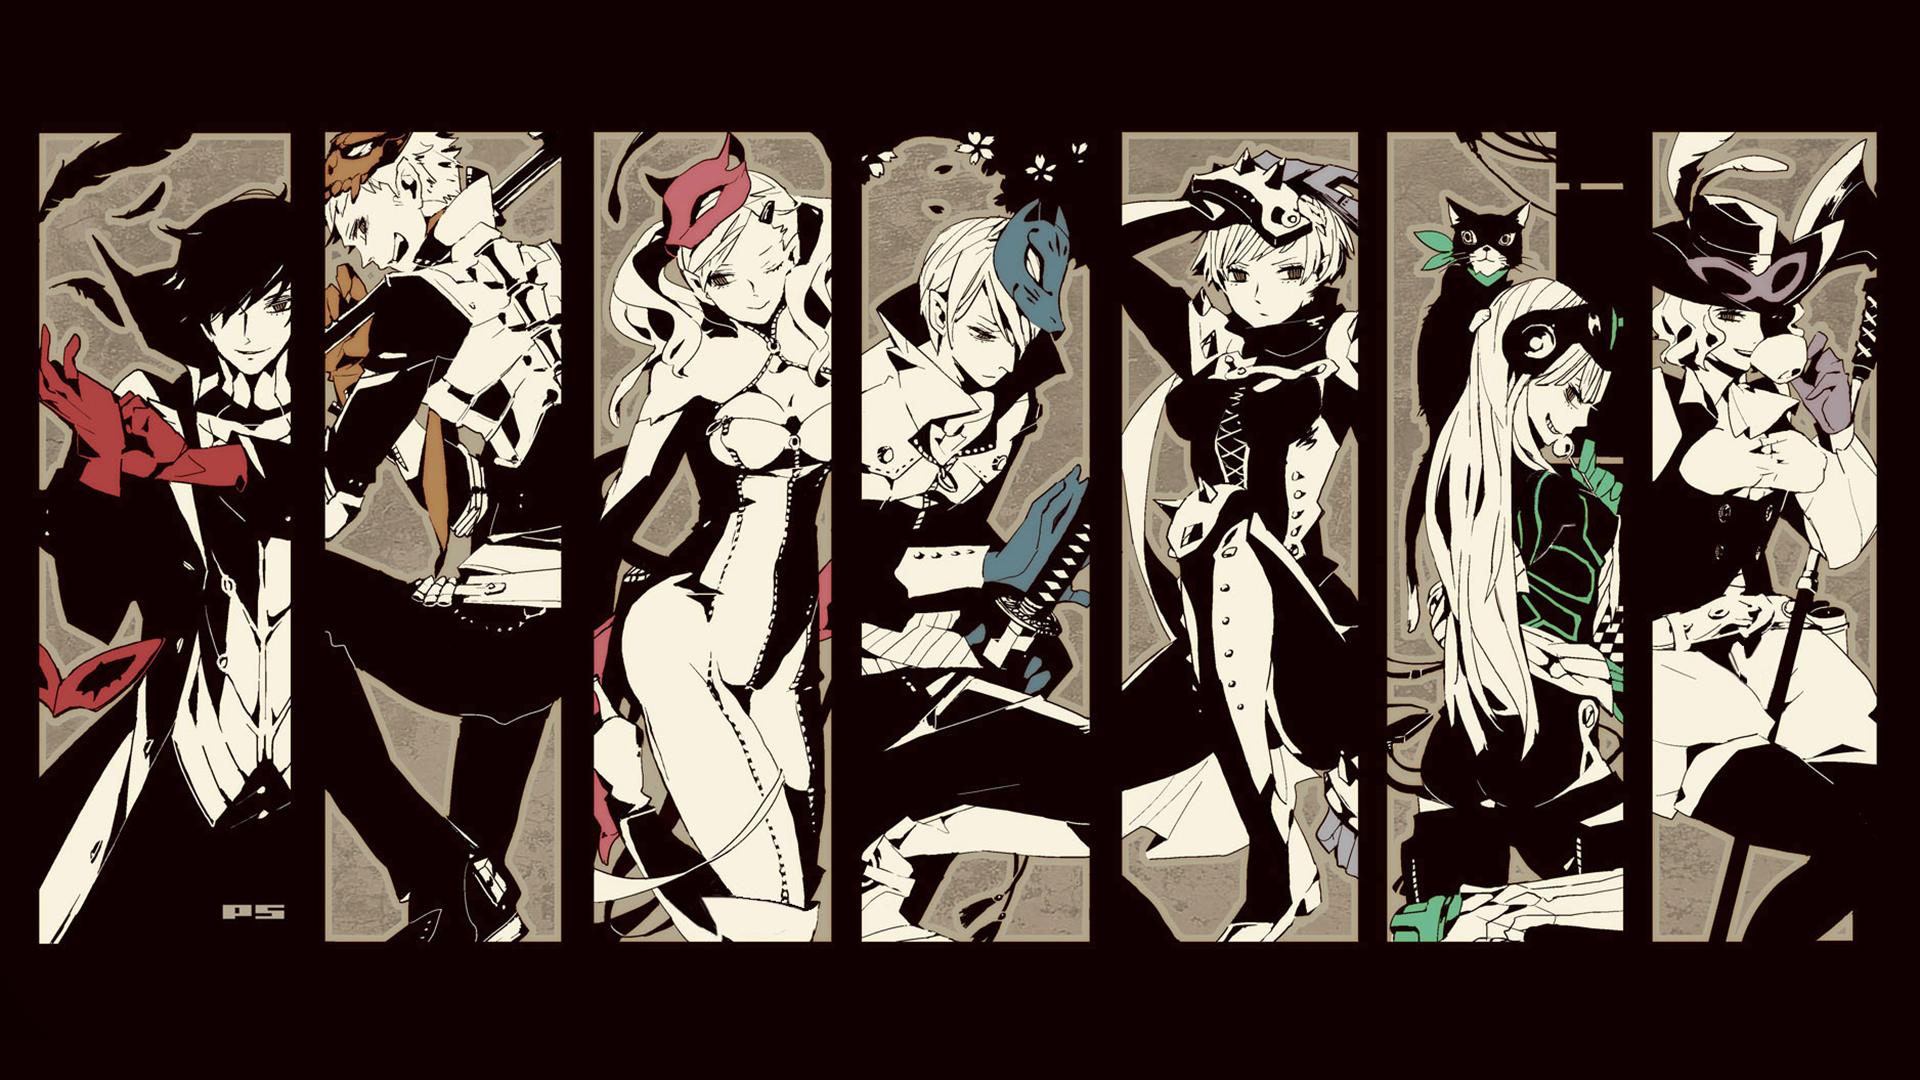 Persona 5 HD Wallpaper | Background Image | 1920x1080 | ID ...